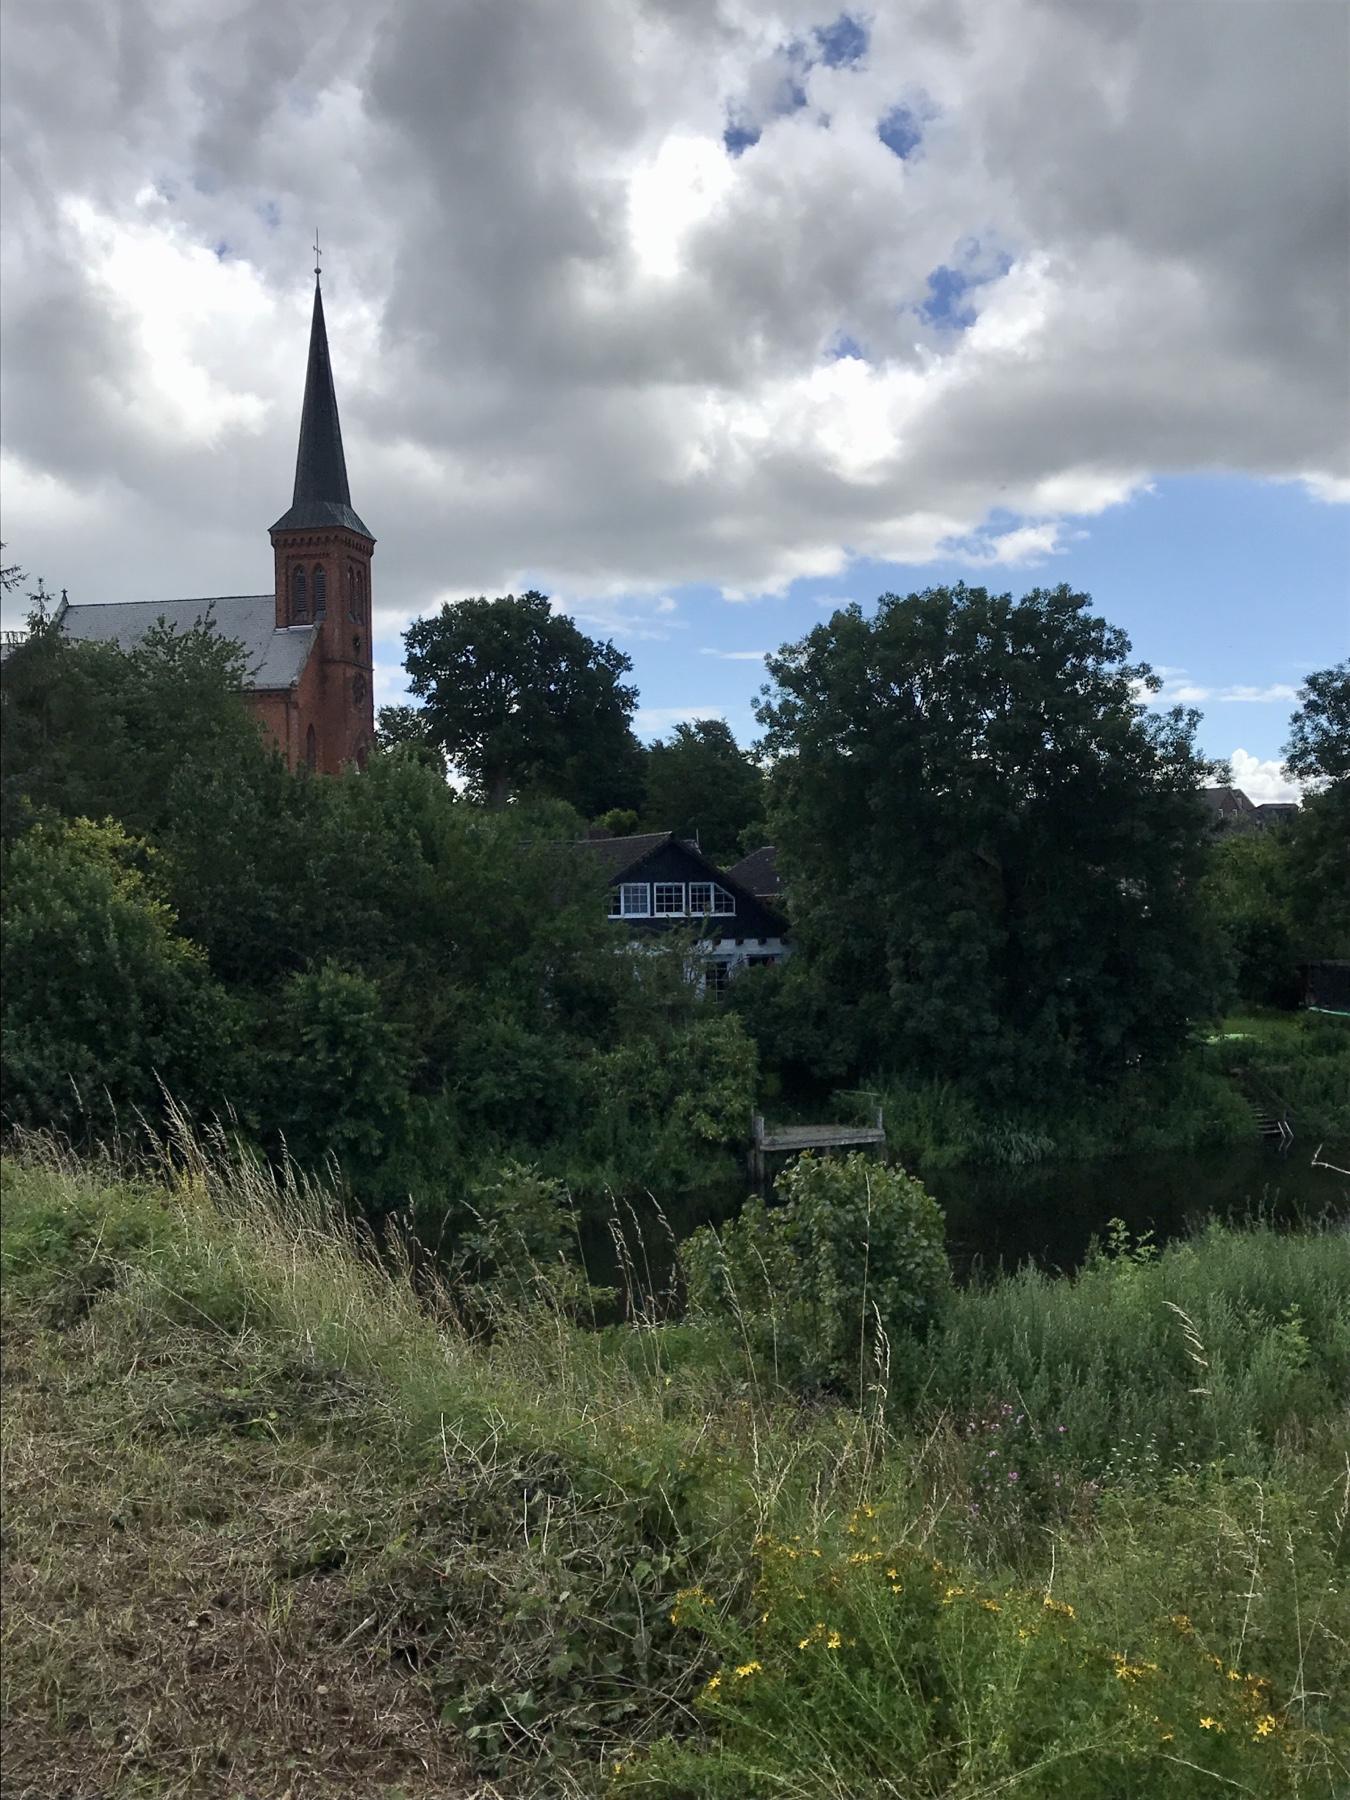 Kirche Klein Wesenberg, Stormarnweg Etappe 6 nach Lübeck